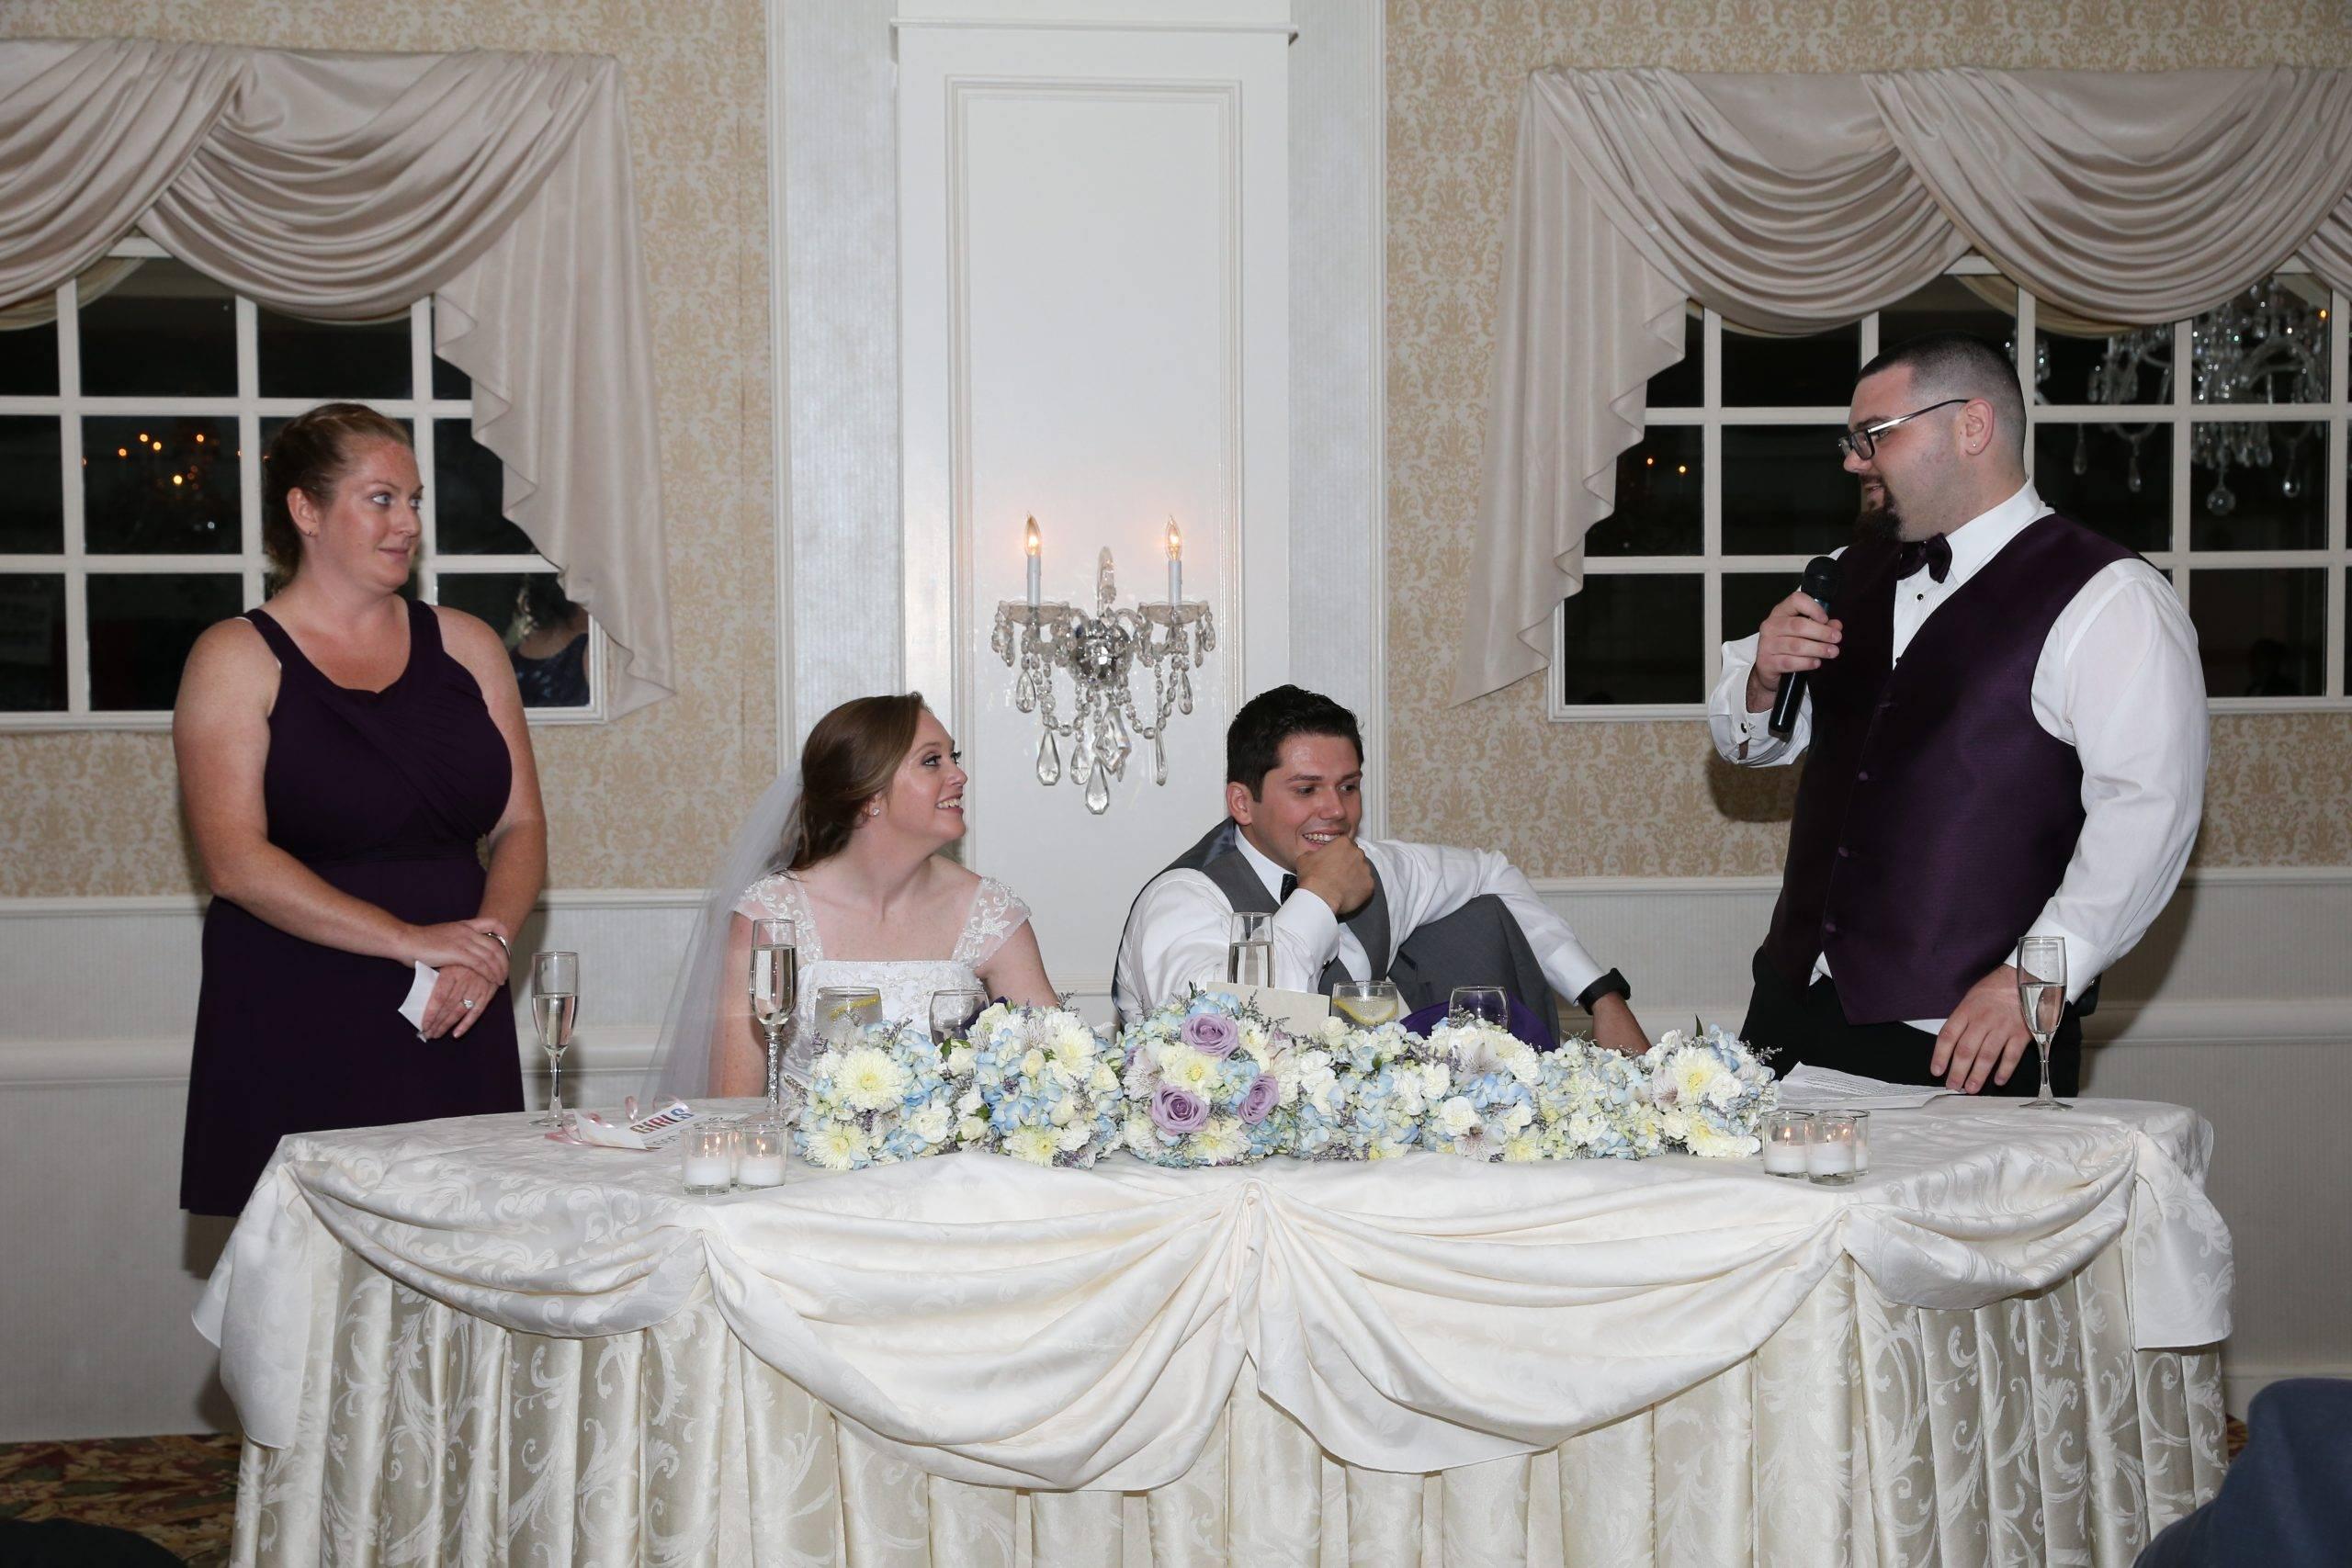 Bridgewater Manor wedding speech to bride and groom